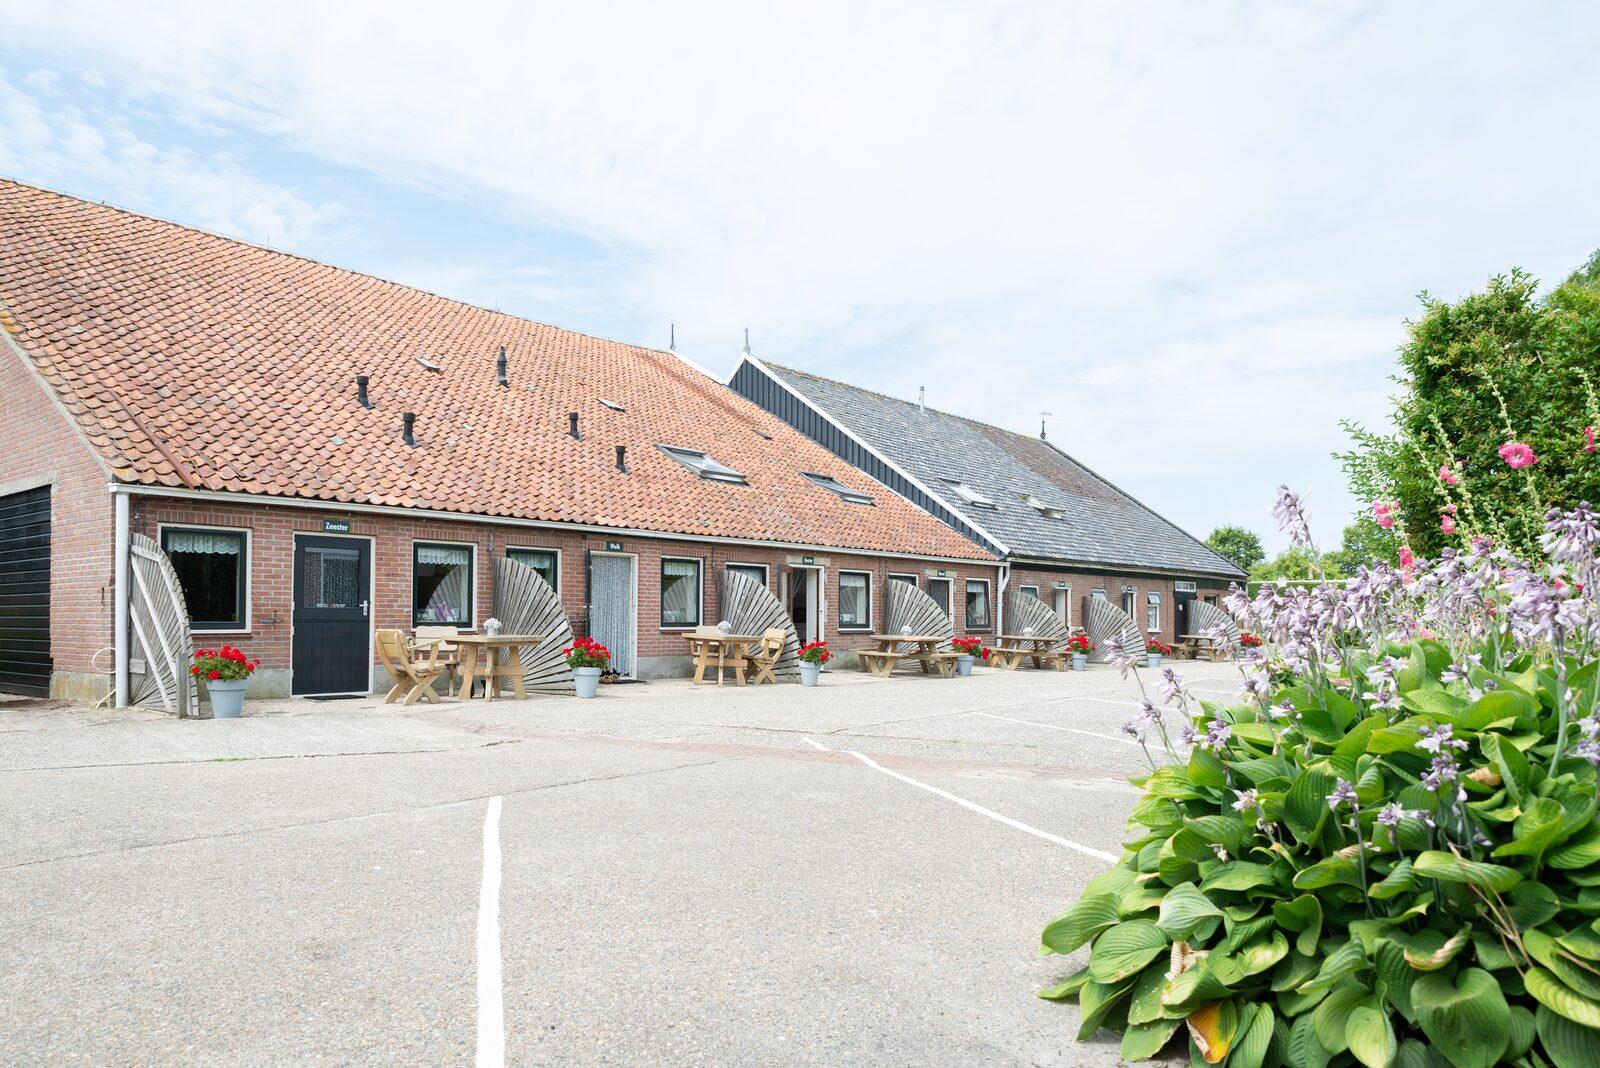 "Vakantiehuis - Lokkershofweg 7 | Noordwelle ""Kreeft, Zeester, Wulk''"